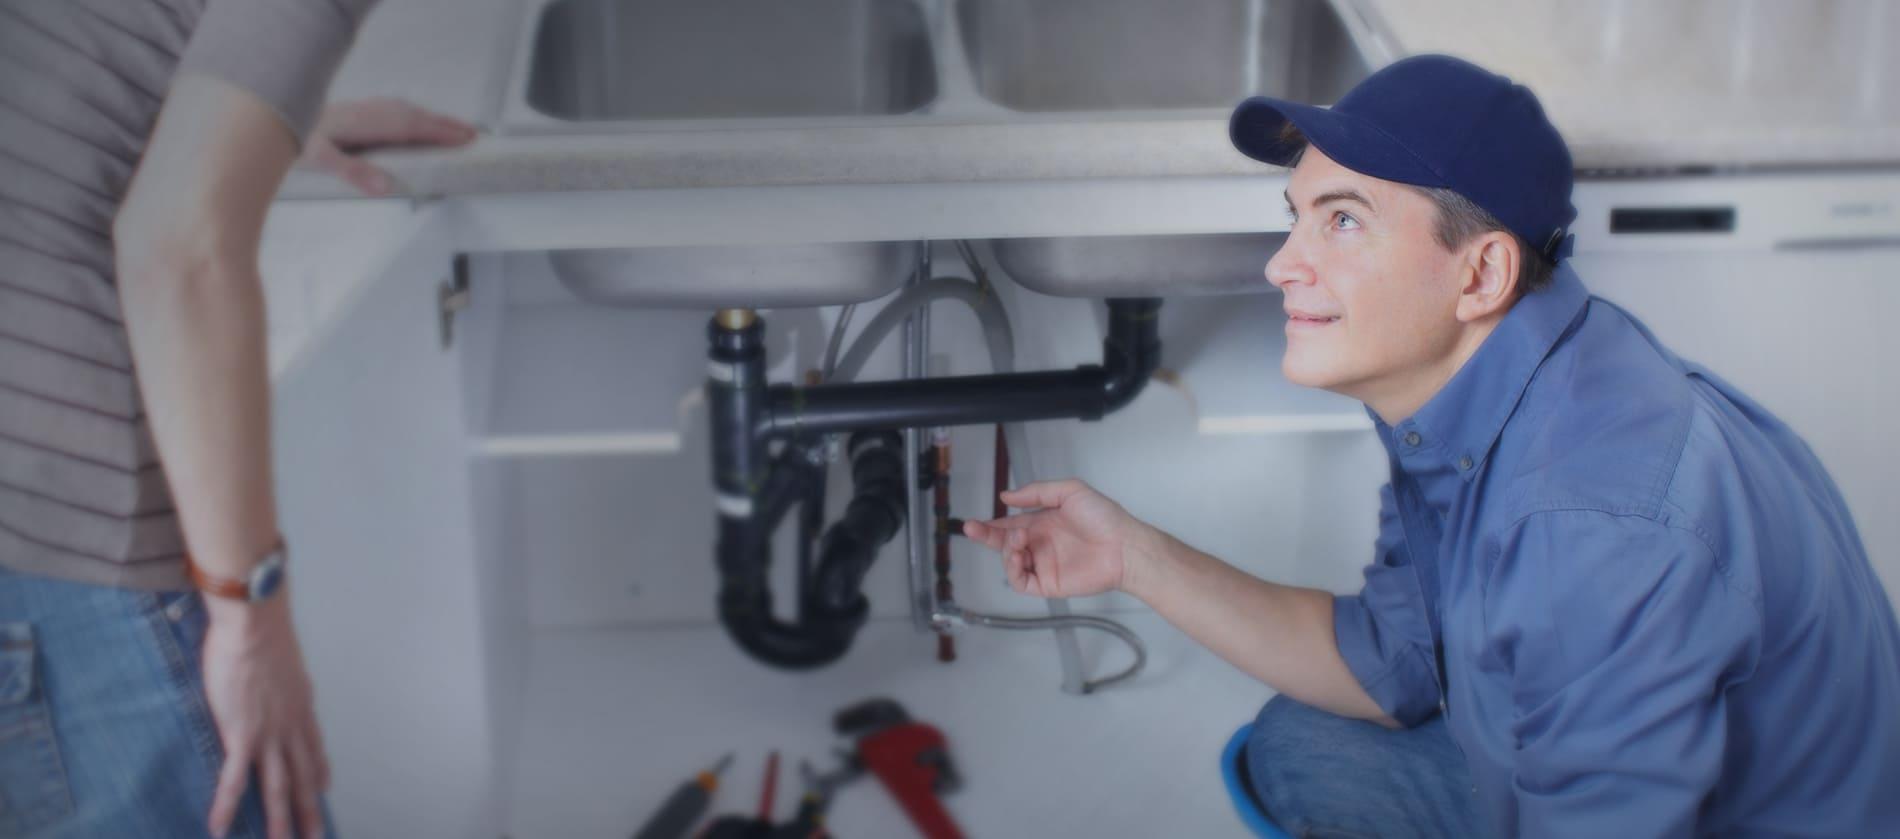 Broward County Plumber - Johns Plumbing